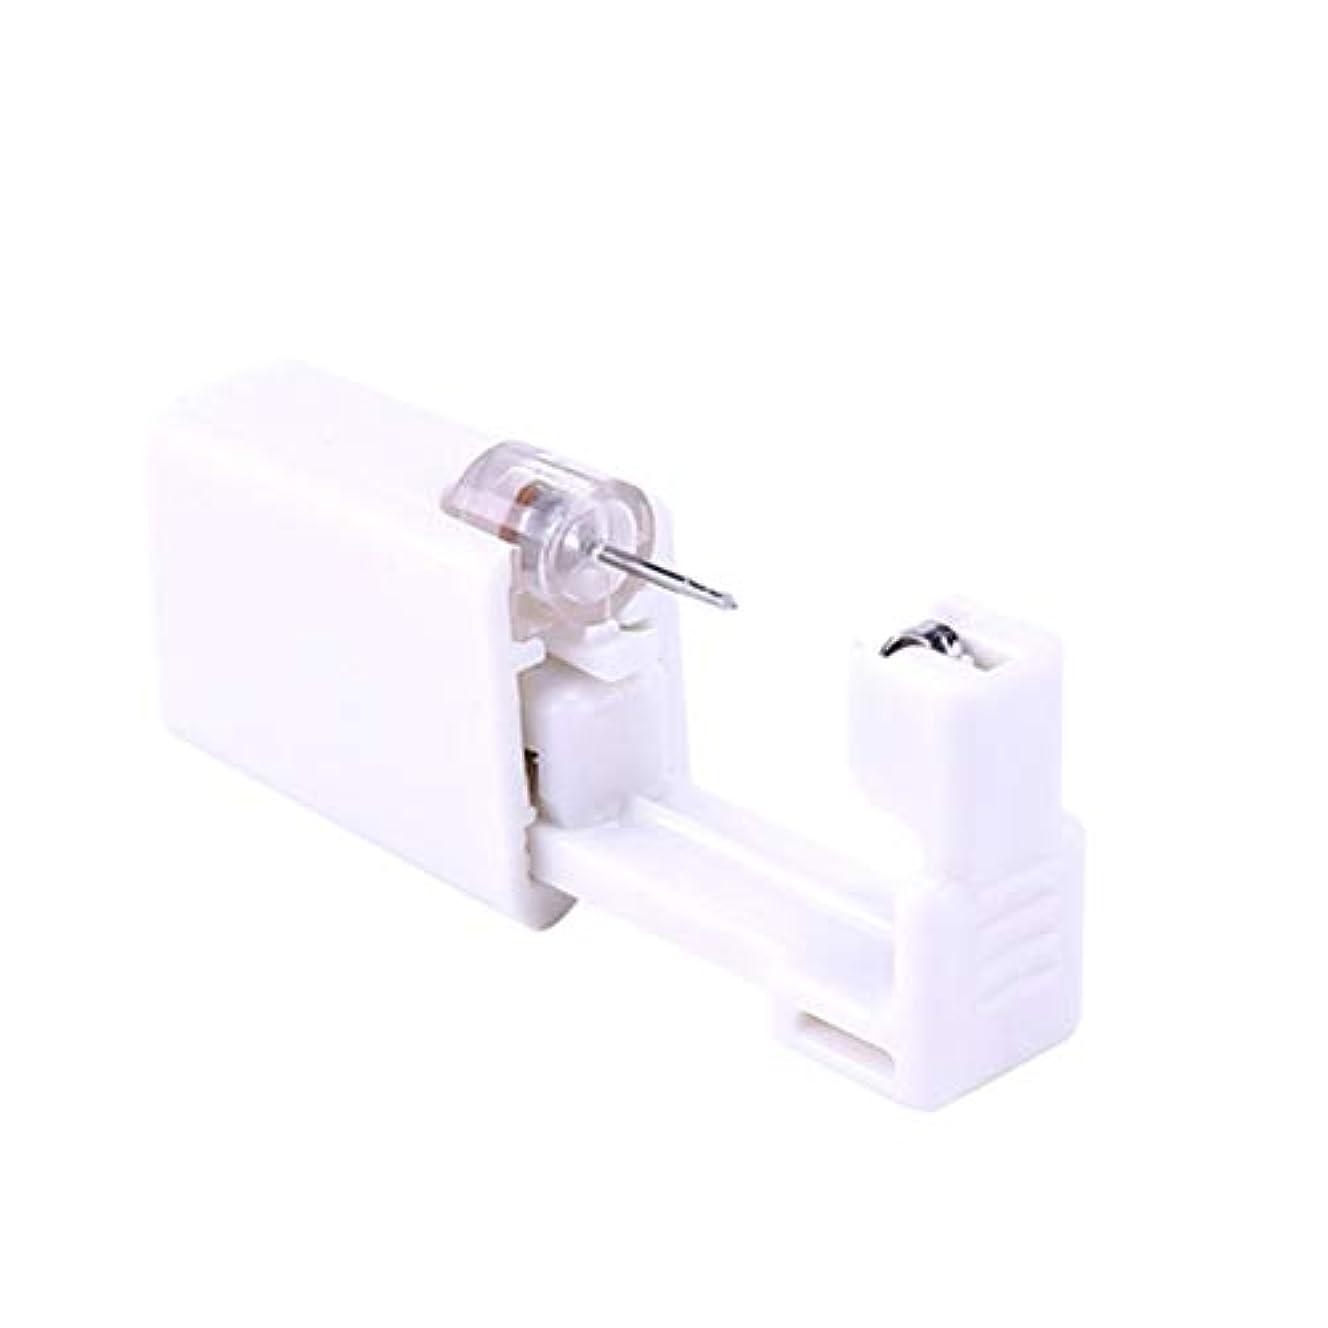 SUPVOX 2本使い捨て耳ピアスガンボディピアスガンピアスツールピアスデバイス(ホワイト)